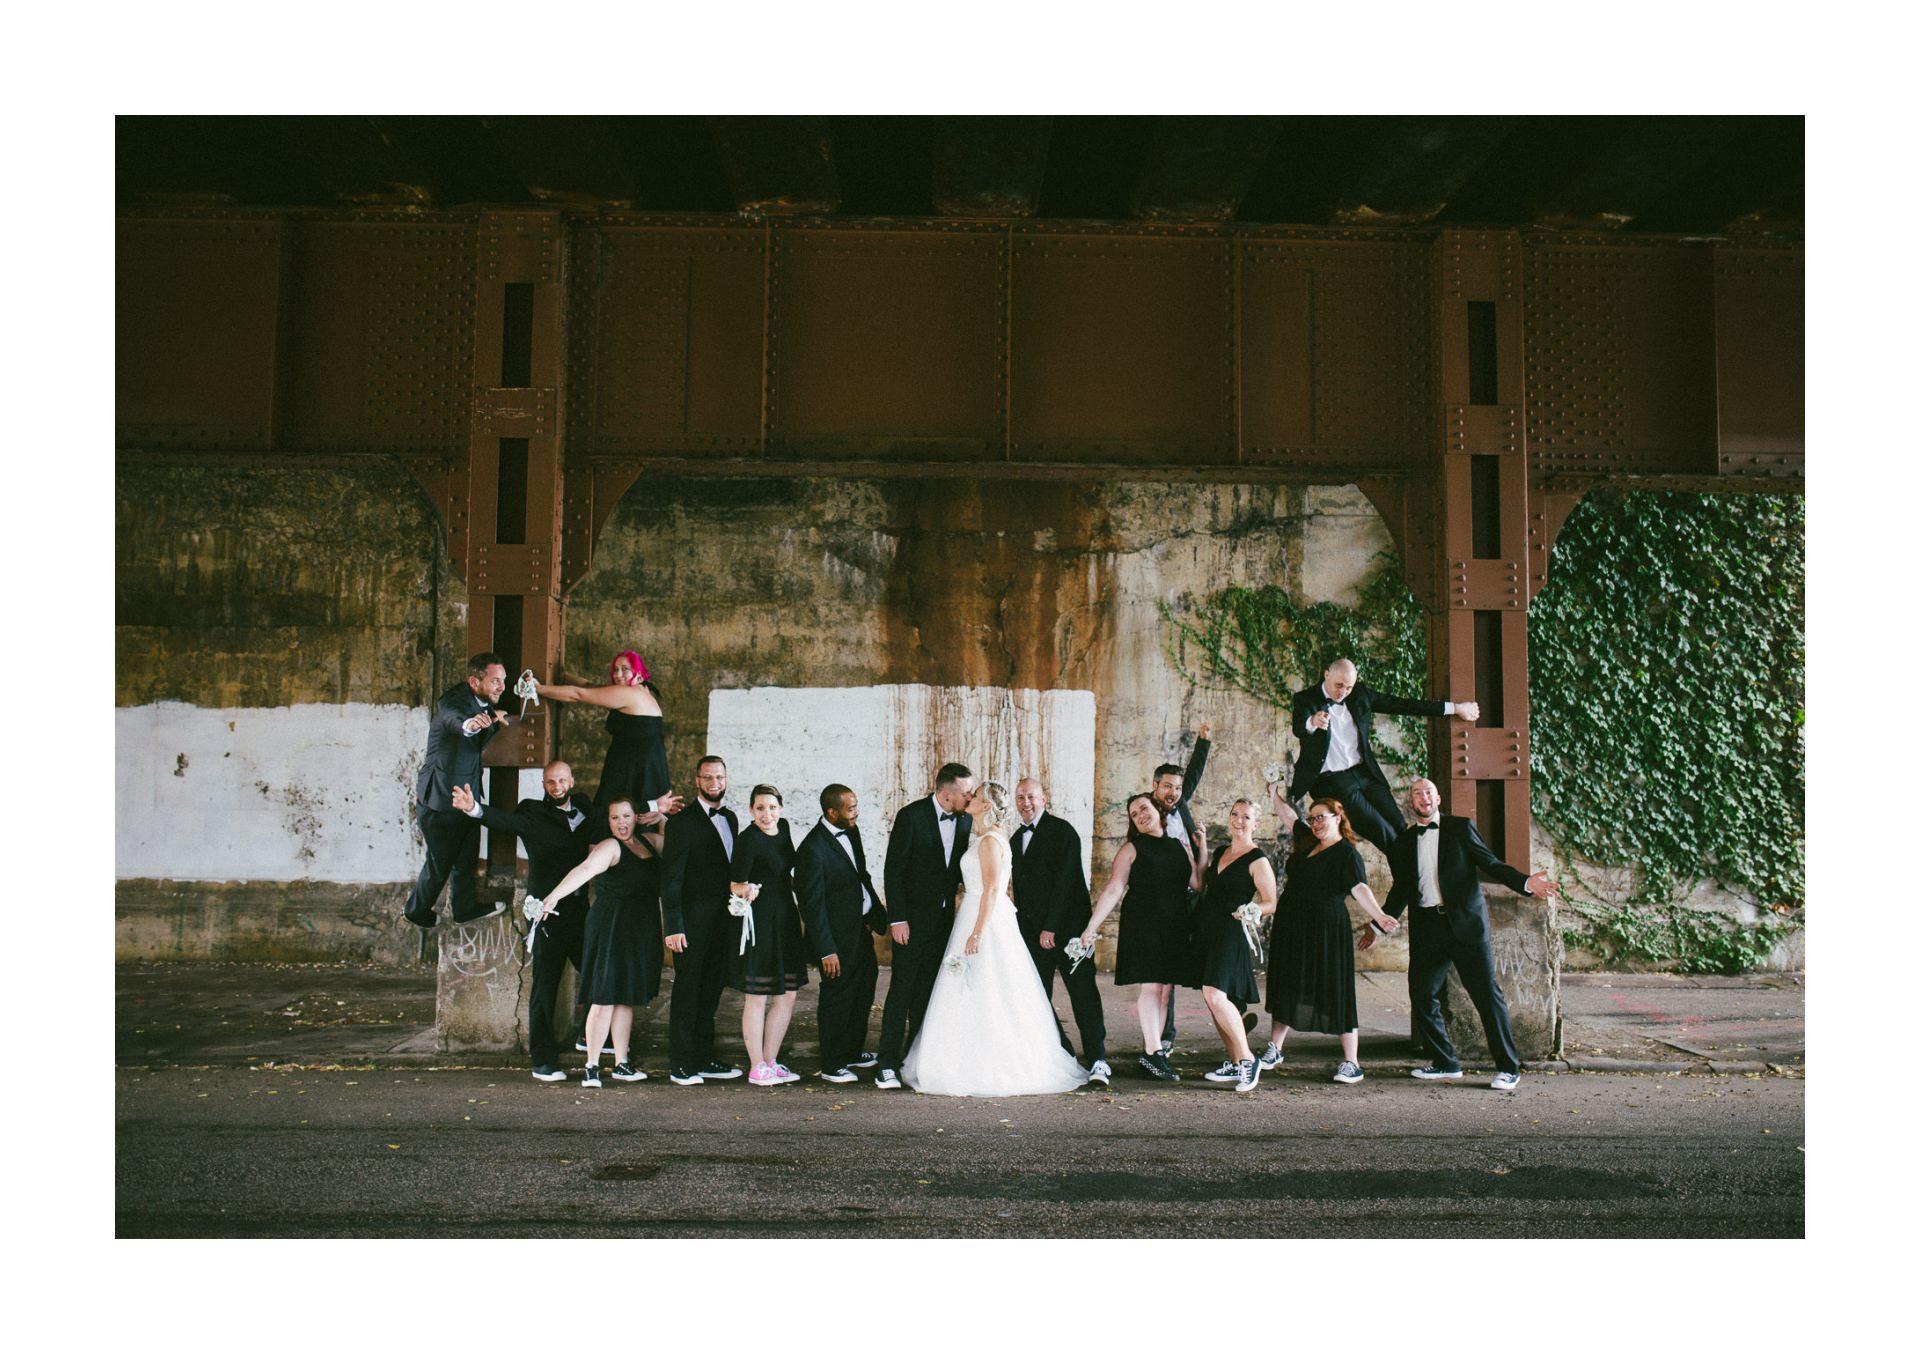 Goldhorn Brewery Wedding Photos in Cleveland 1 49.jpg